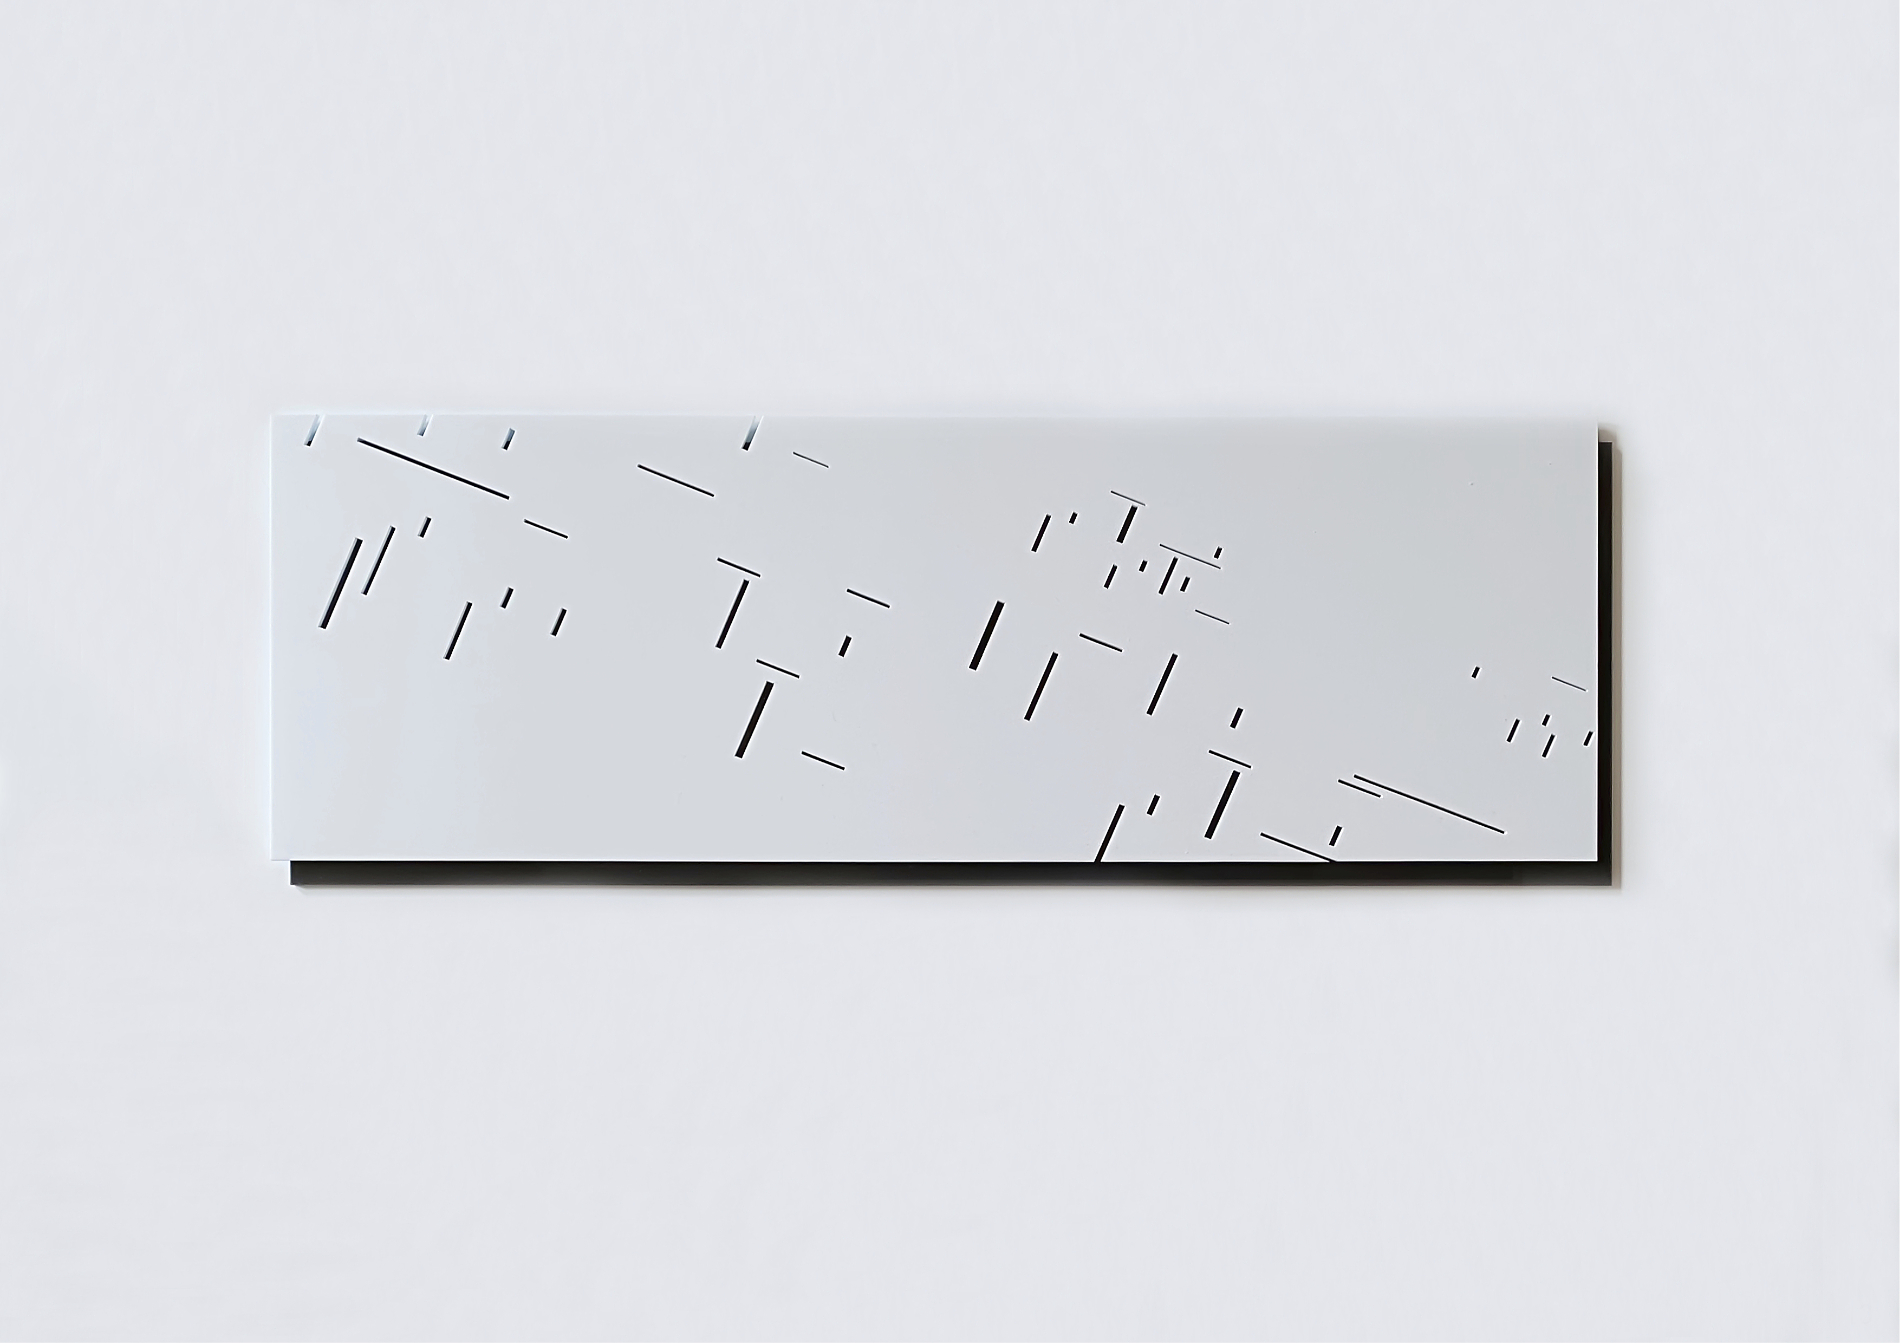 rethink_#3_2021_perspex black and white s/w_21 x 61 x 0,6cm